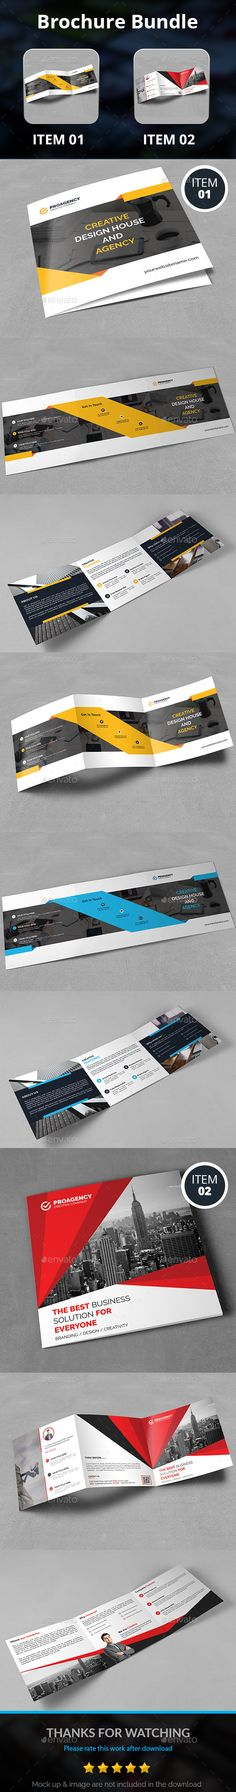 Square Brochure Bundle — Photoshop PSD #bifold brochure #trifold • Download ➝ https://graphicriver.net/item/square-brochure-bundle/19160922?ref=pxcr